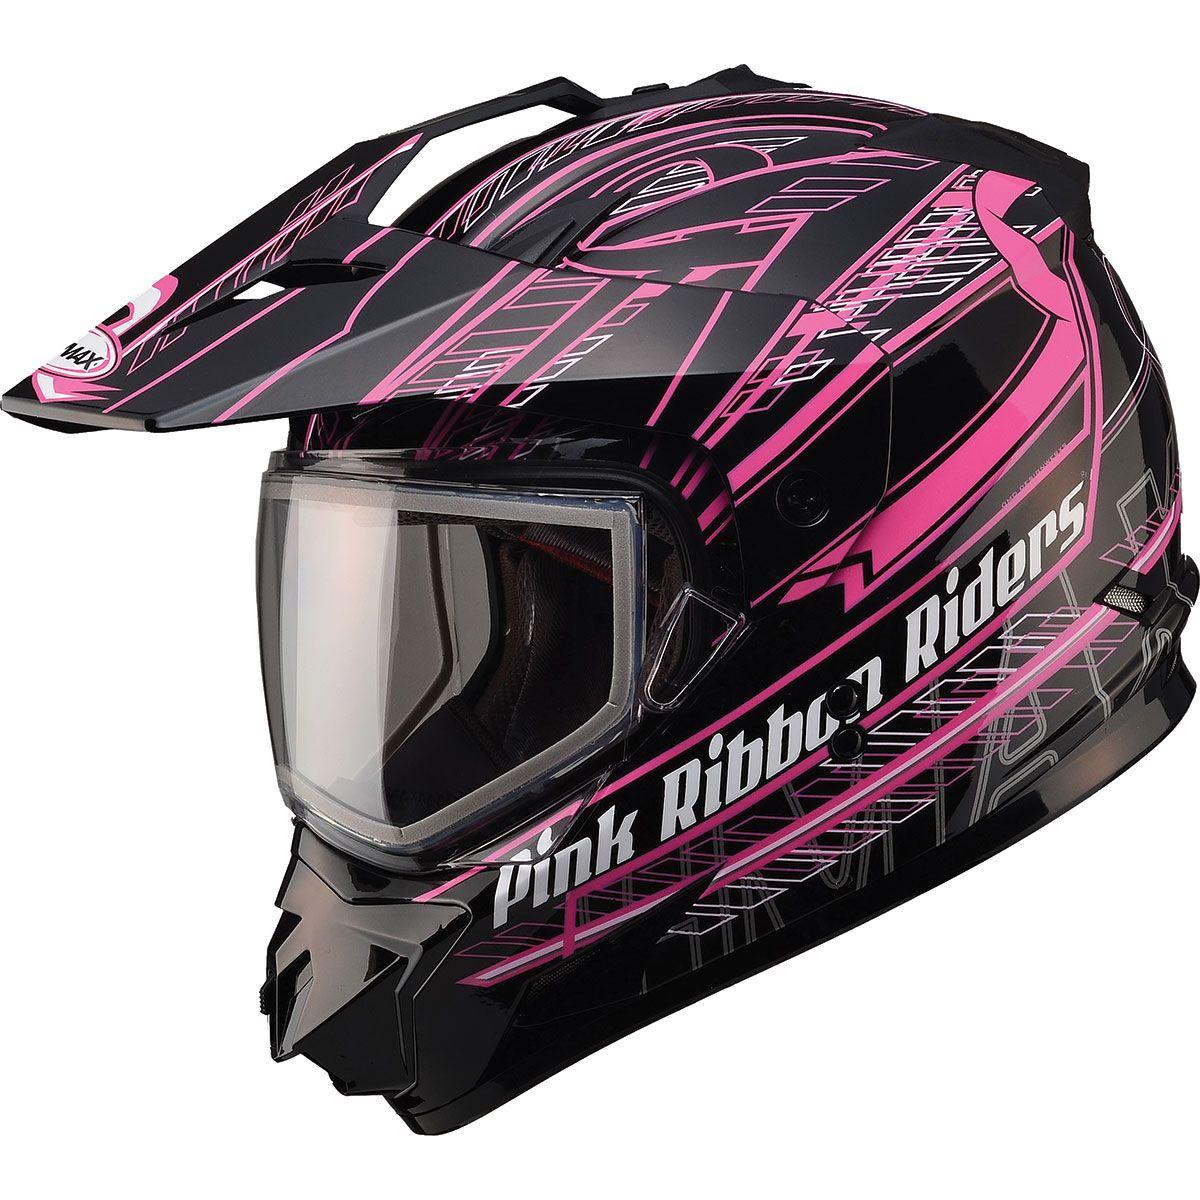 Gmax Gm11s Pink Ribbon Snow Sport Snowmobile Helmet Snowmobile Helmets Snowmobile Motorcycle Riding Gear